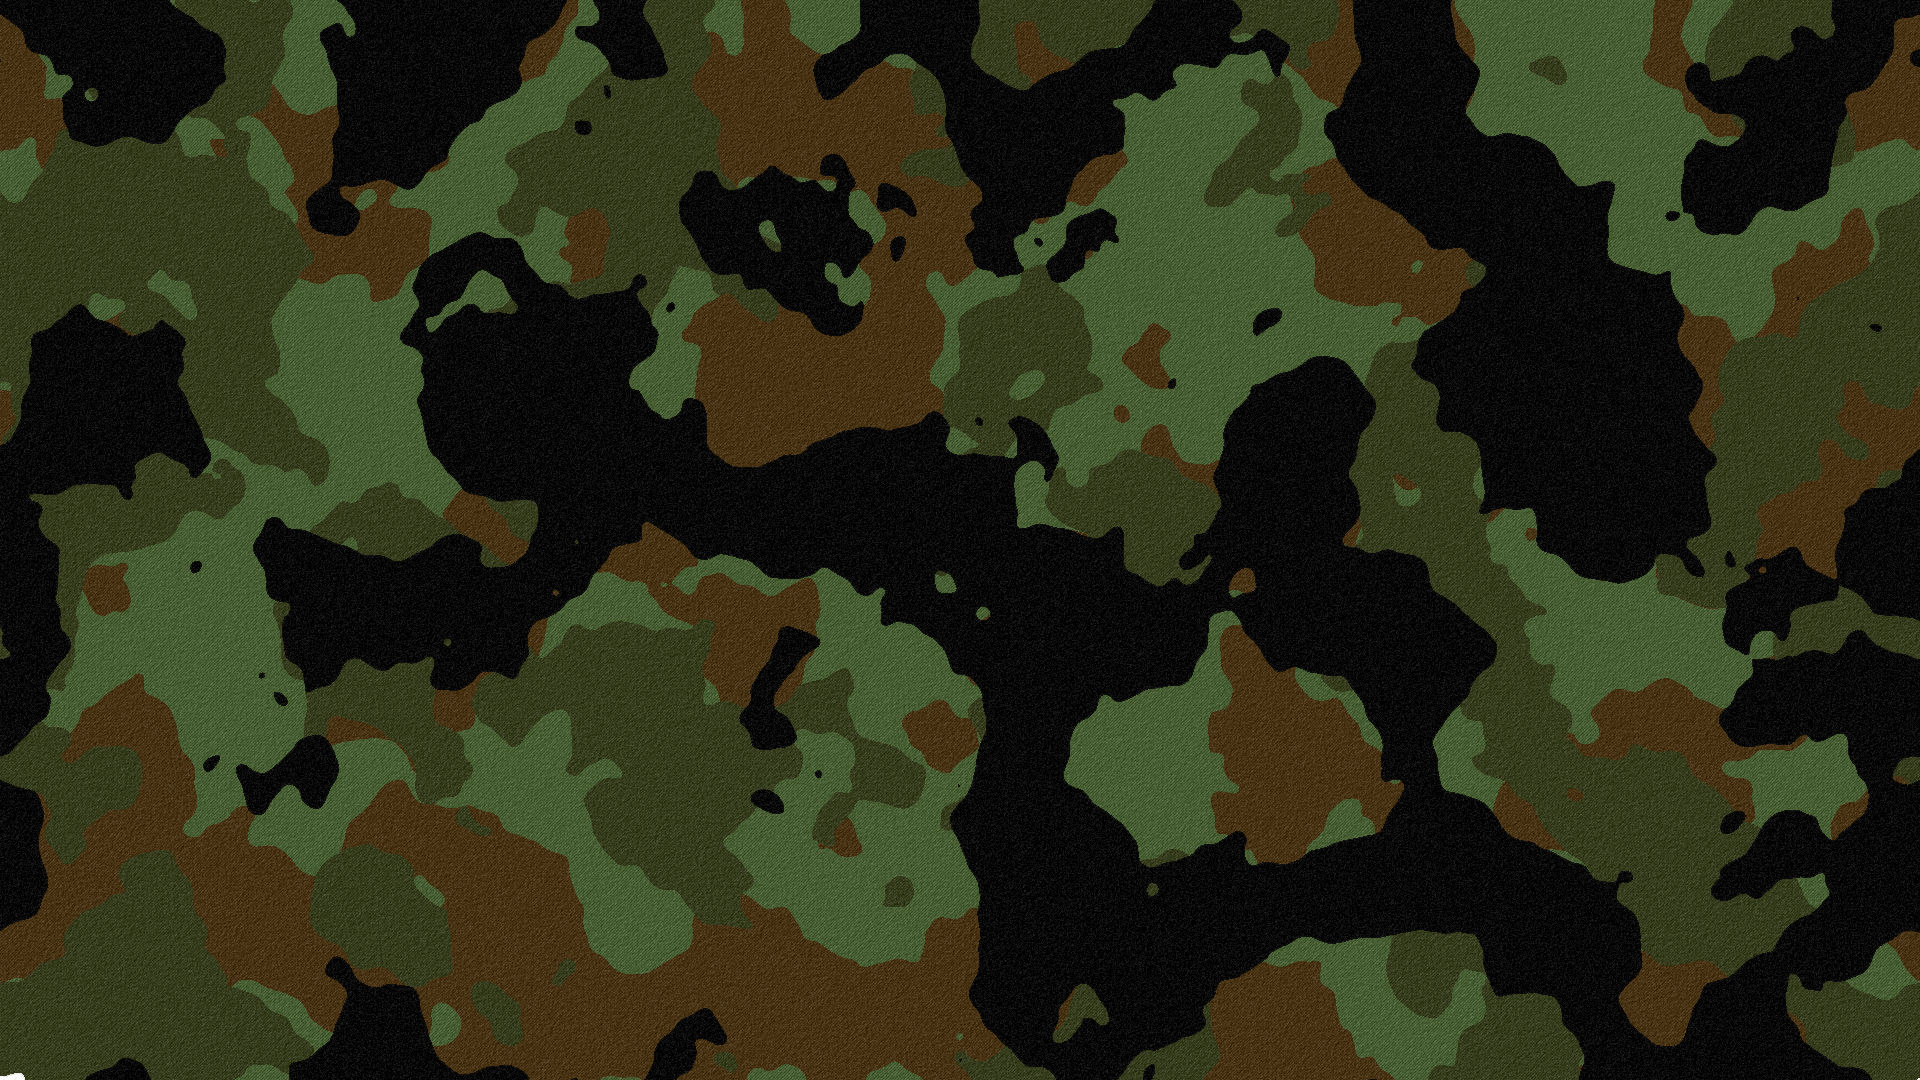 militarismo alexandre. taleb - Influência Militar